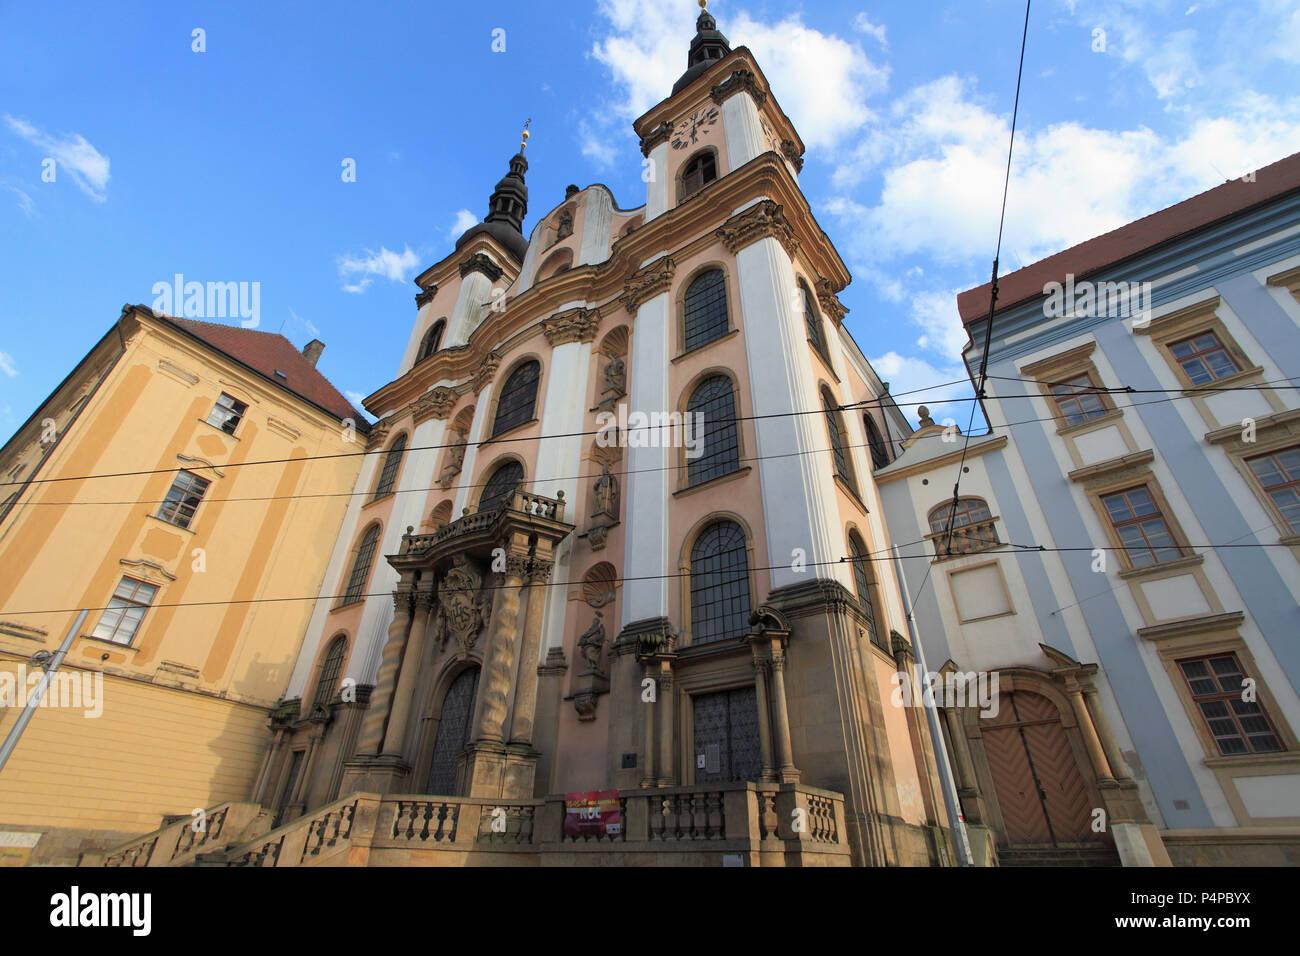 Czech Republic, Moravia, Olomouc, Our Lady of the Snows, church, - Stock Image